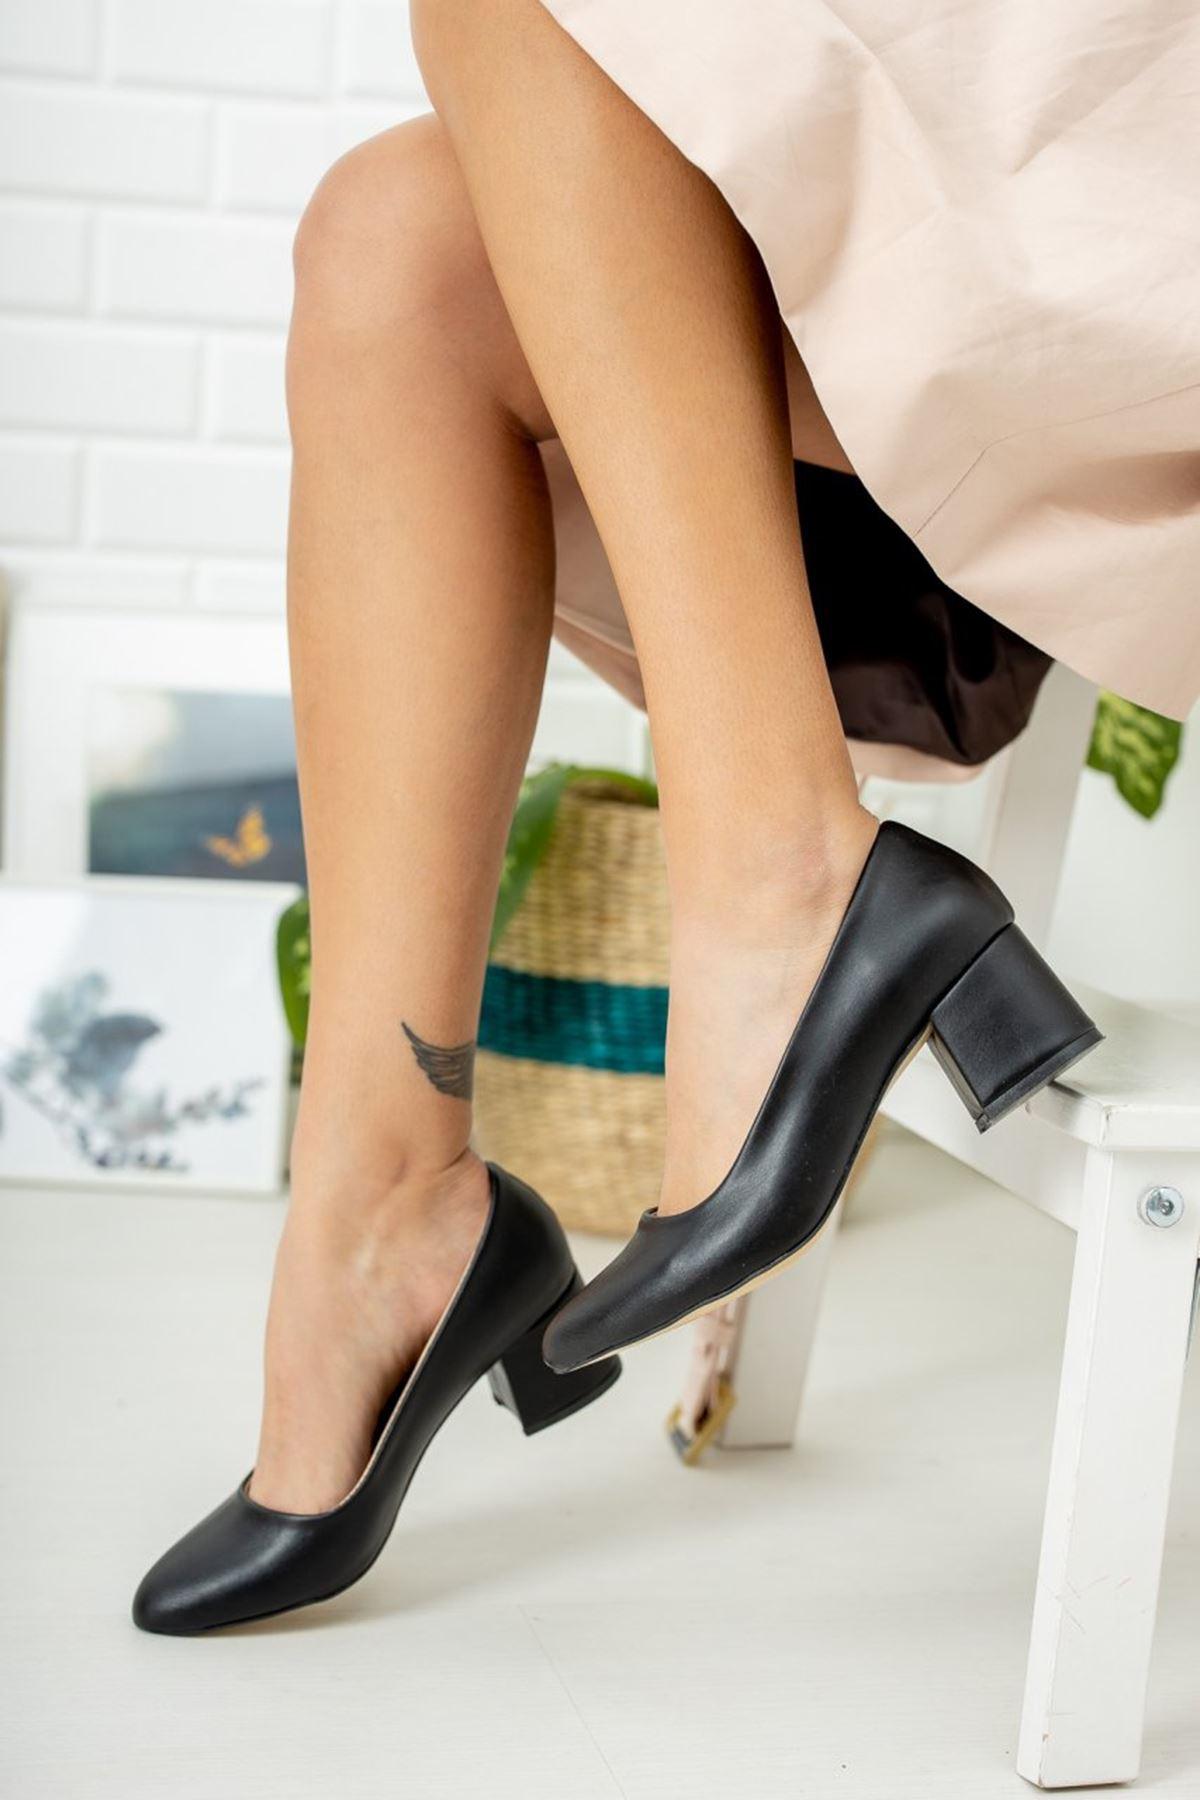 Kadın Voges Kısa Topuklu Mat Deri Siyah Ayakkabı